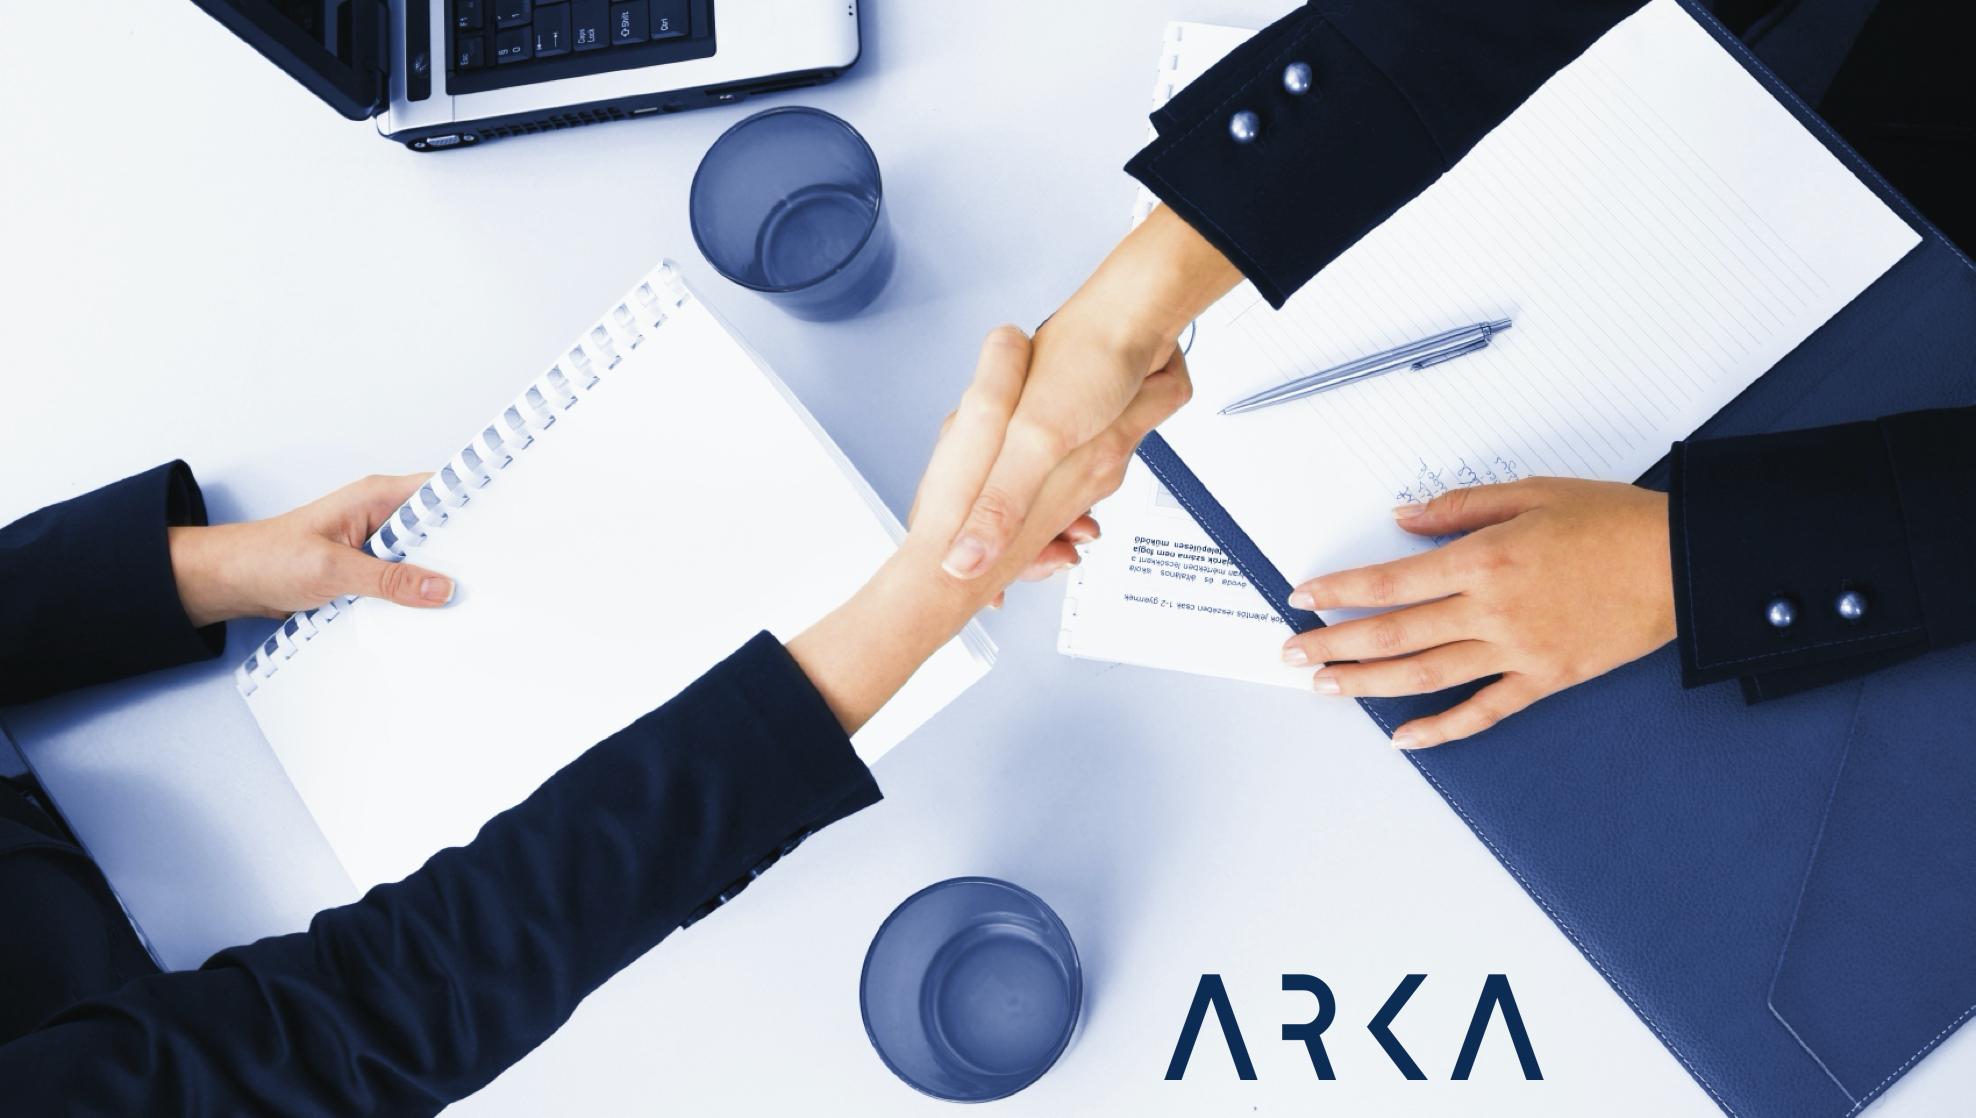 arka partnership banner